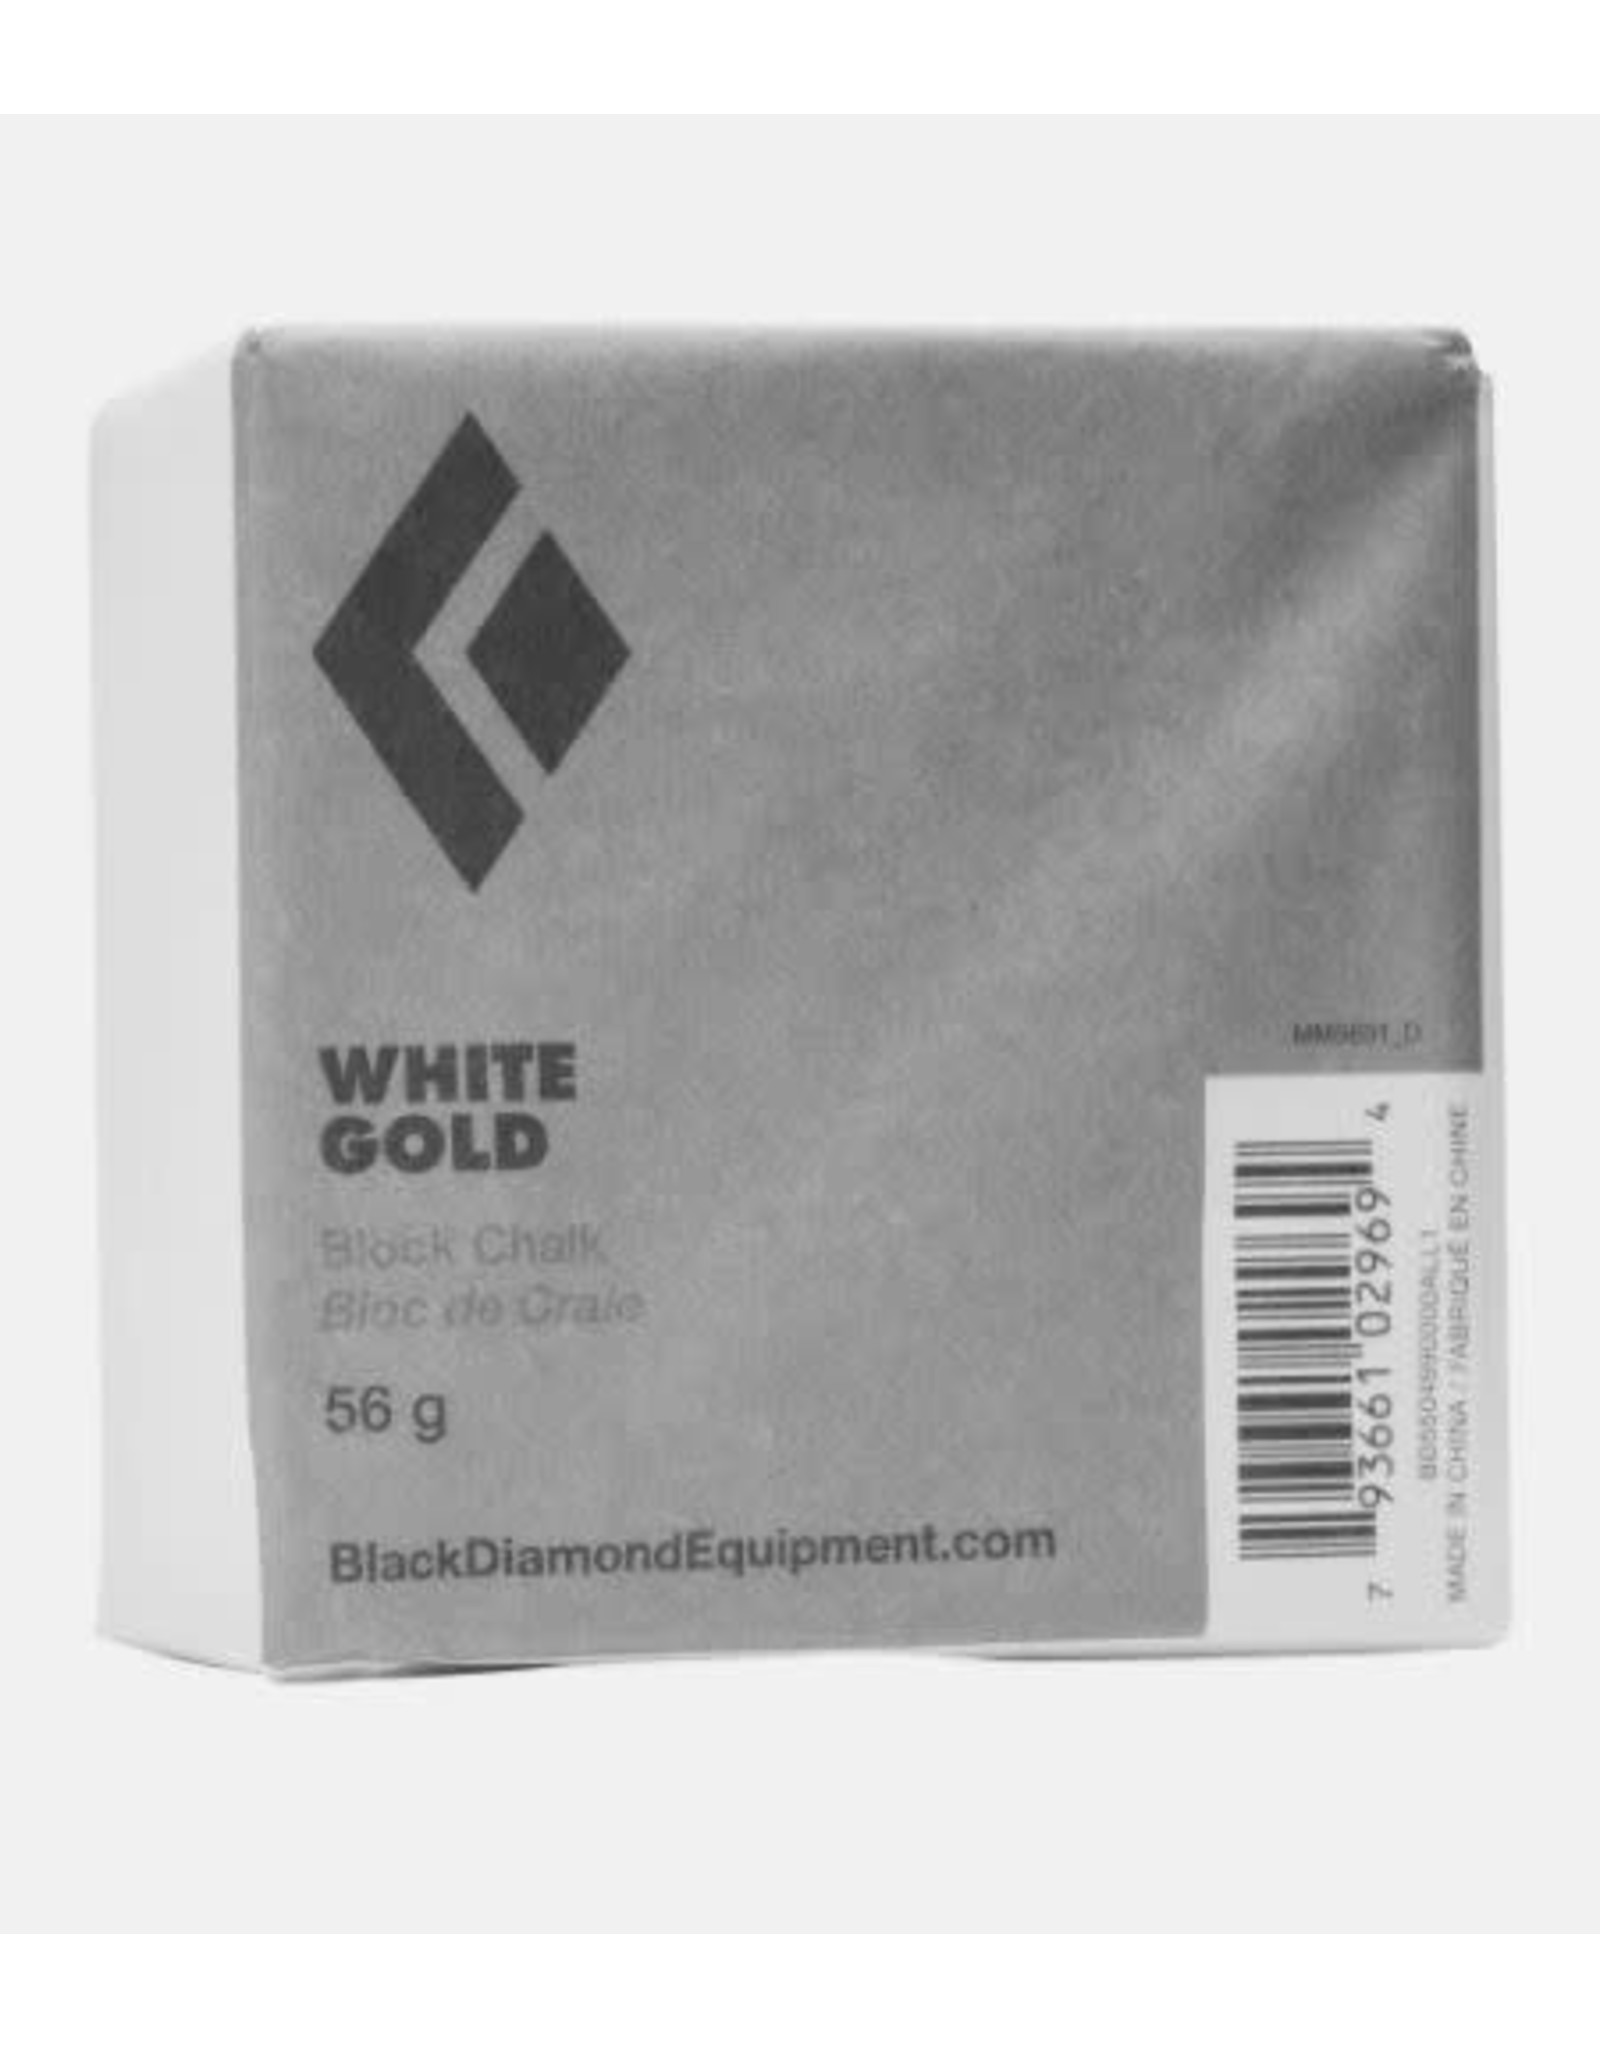 BLACK DIAMOND BLACK DIAMOND WHITE GOLD CHALK 56G #BD5504990000ALL1